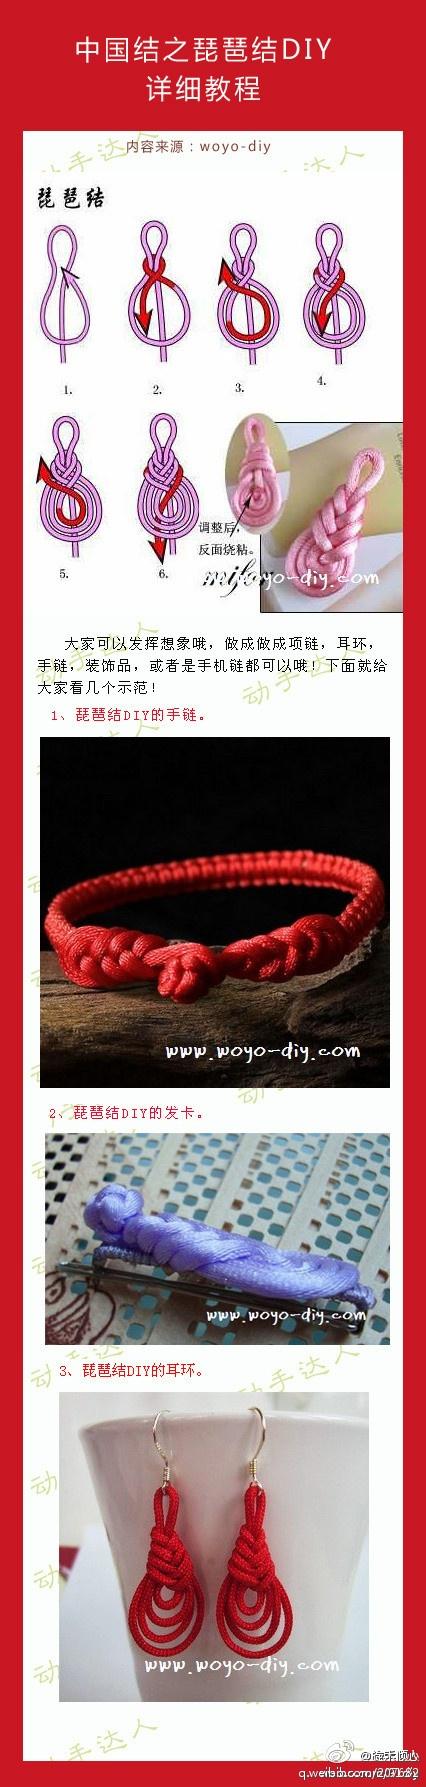 Pipa Knot earrings: Ideas, Macrame, Diy Art, Chinese Knot, Diy Jewelry, Diy Bracelets, Knots, Diy Earrings, Crafts